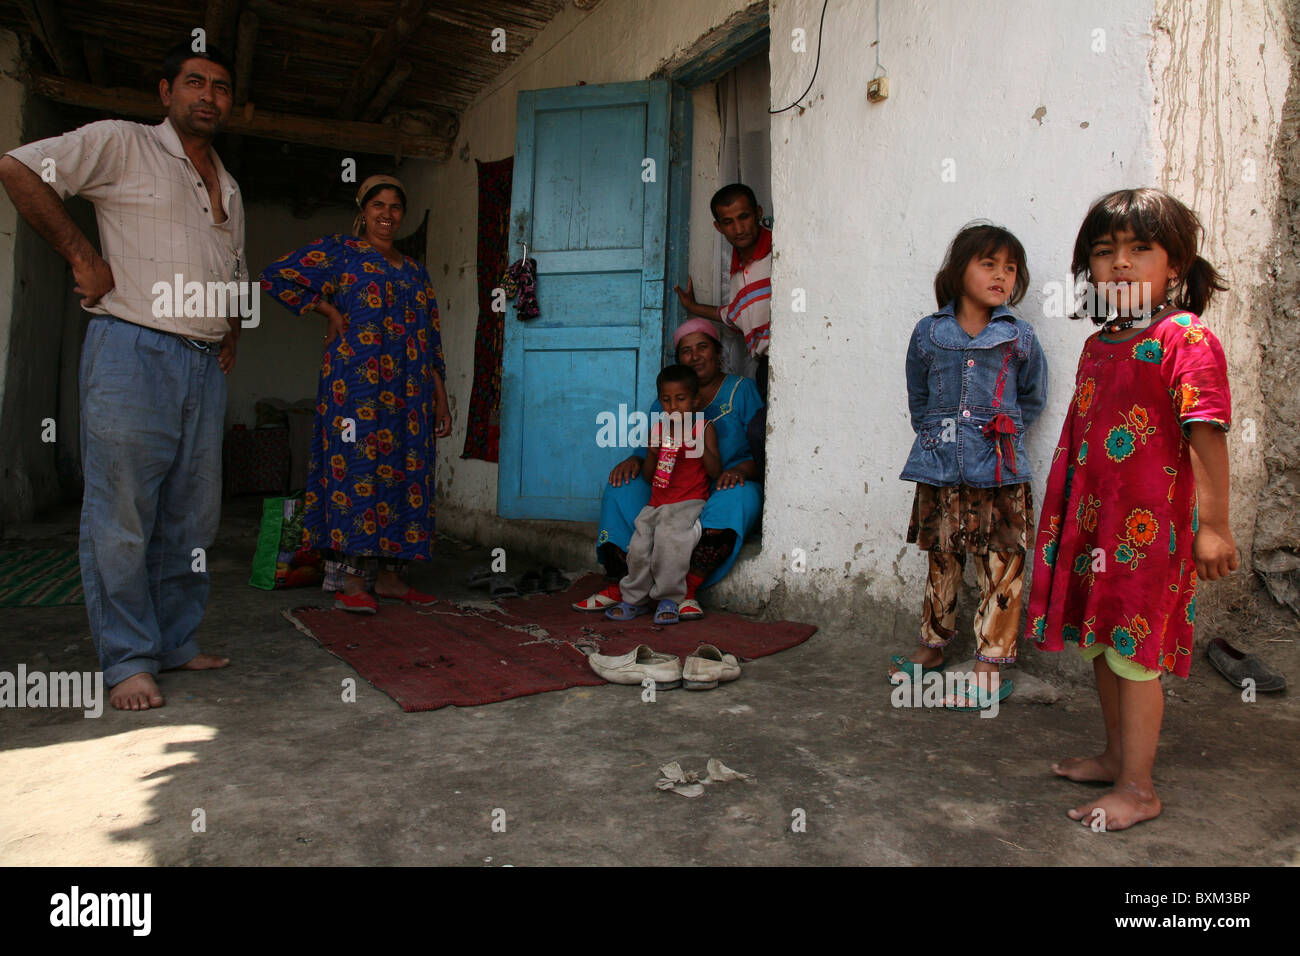 Romani family from the gypsy village of Gigikhana near Bukhara, Uzbekistan.  - Stock Image